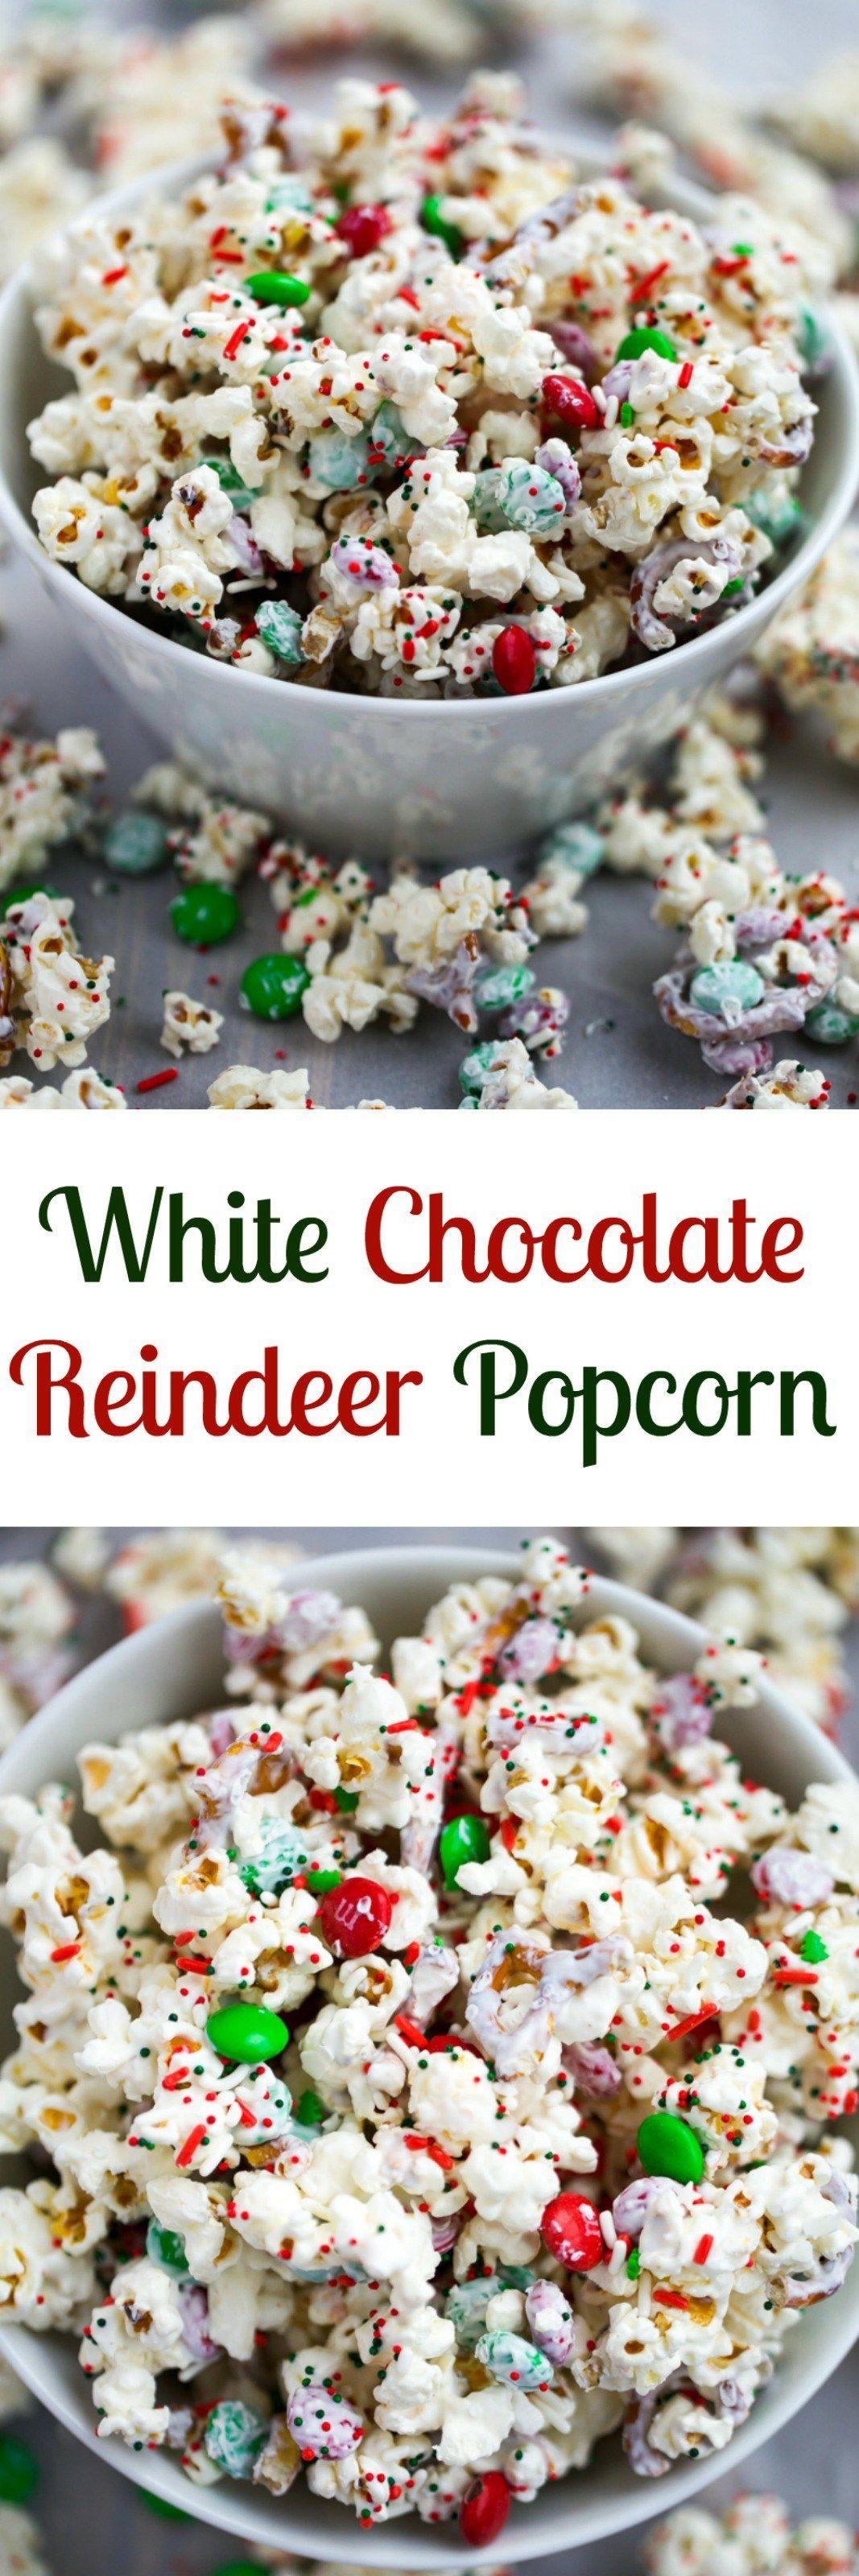 White Chocolate Reindeer Popcorn #dryidea